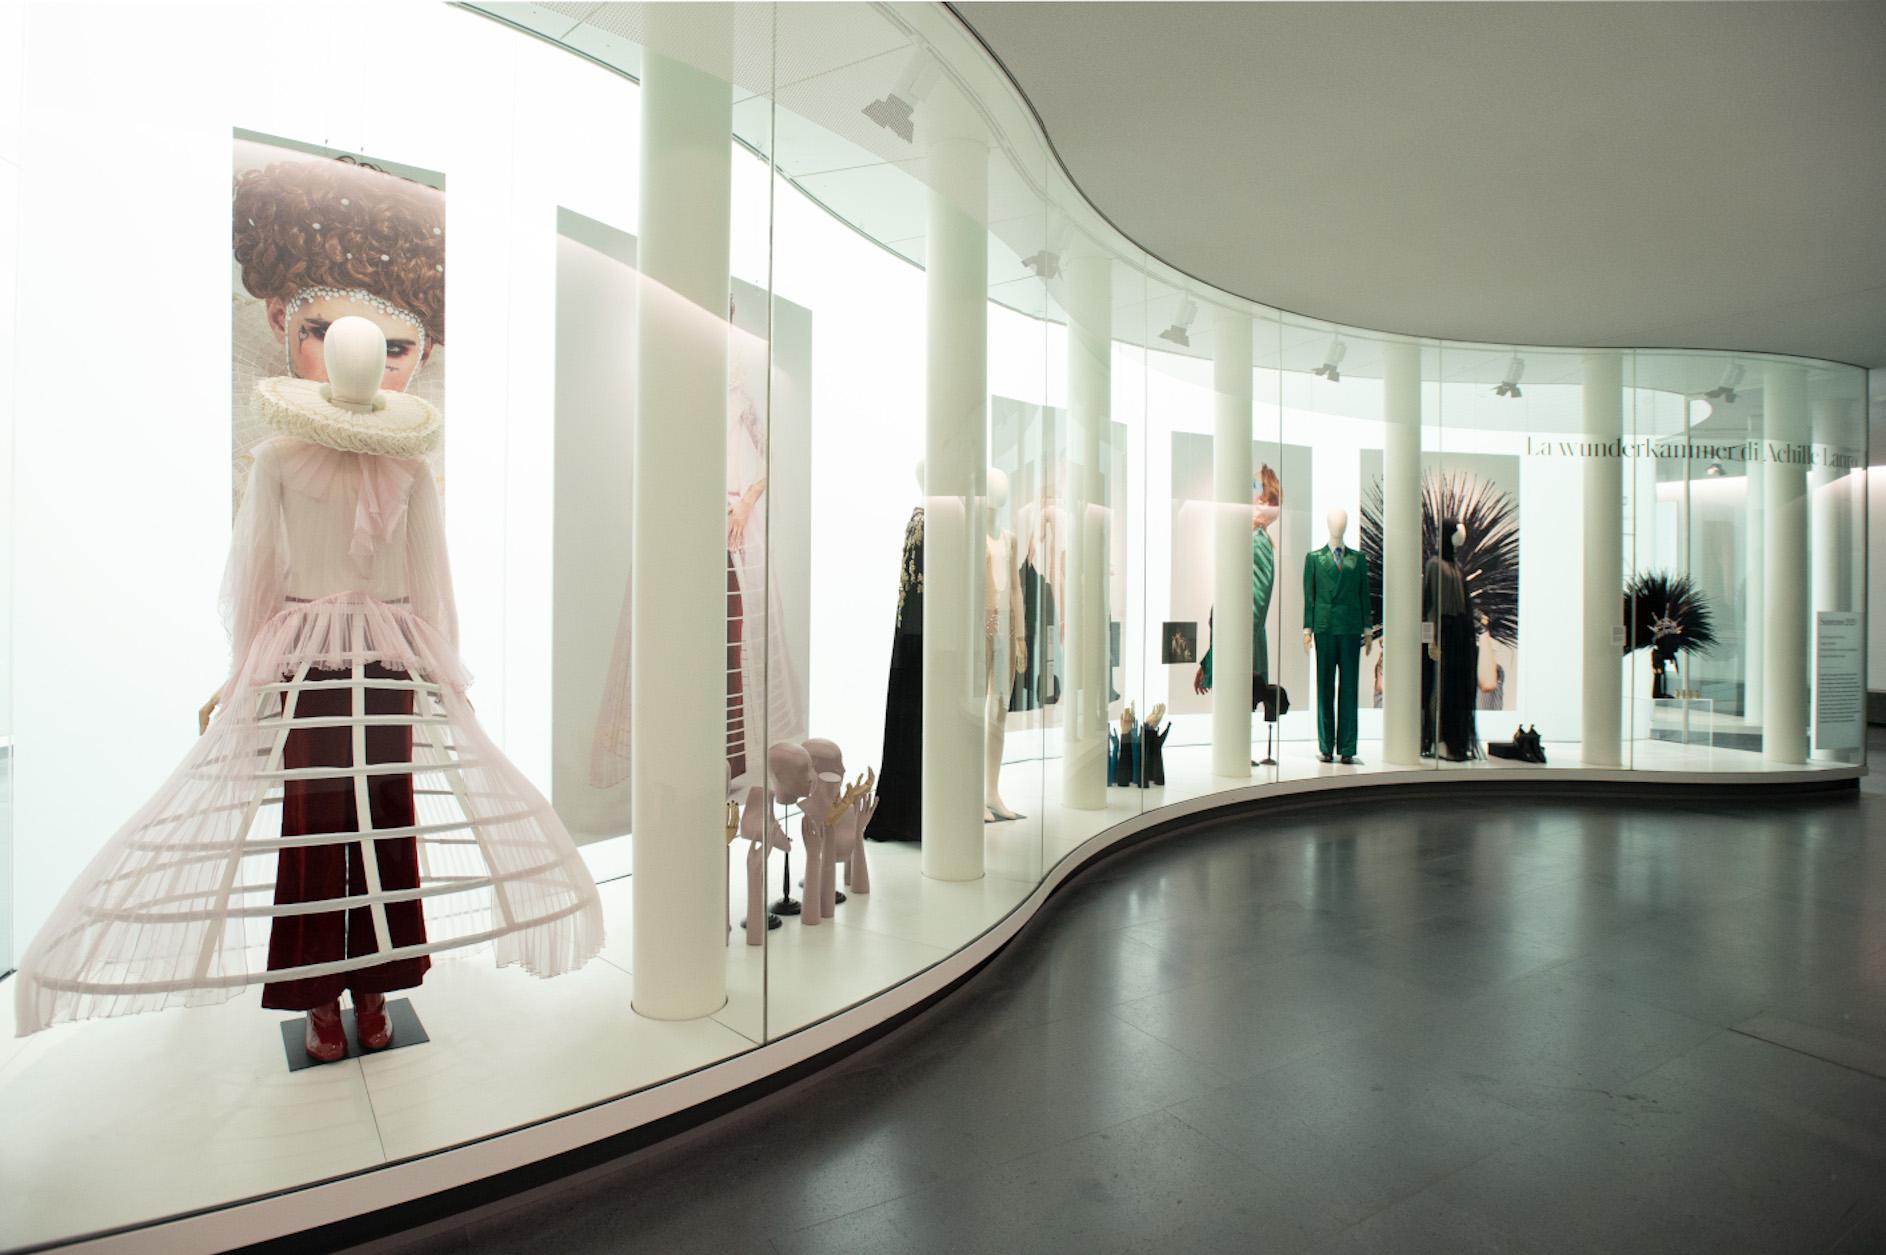 Ecco com'è la mostra di Achille Lauro al Mudec di Milano. Una wunderkammer di 22 metri